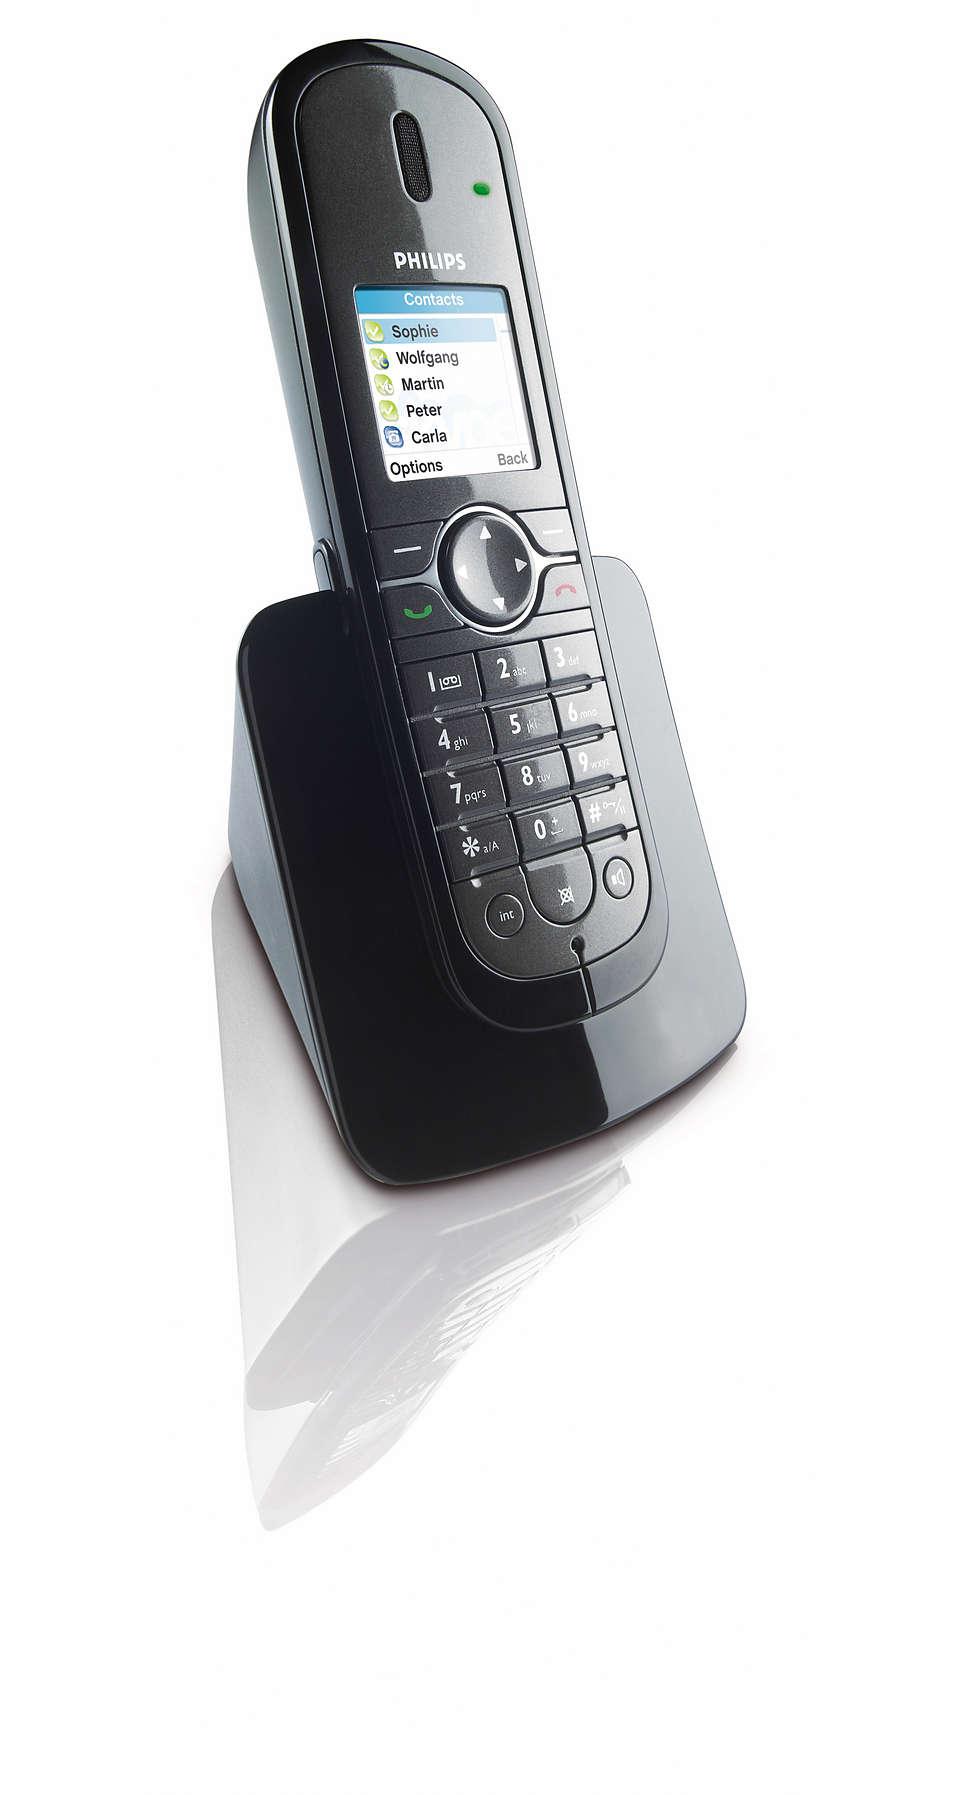 Skype™ and landline calls easily